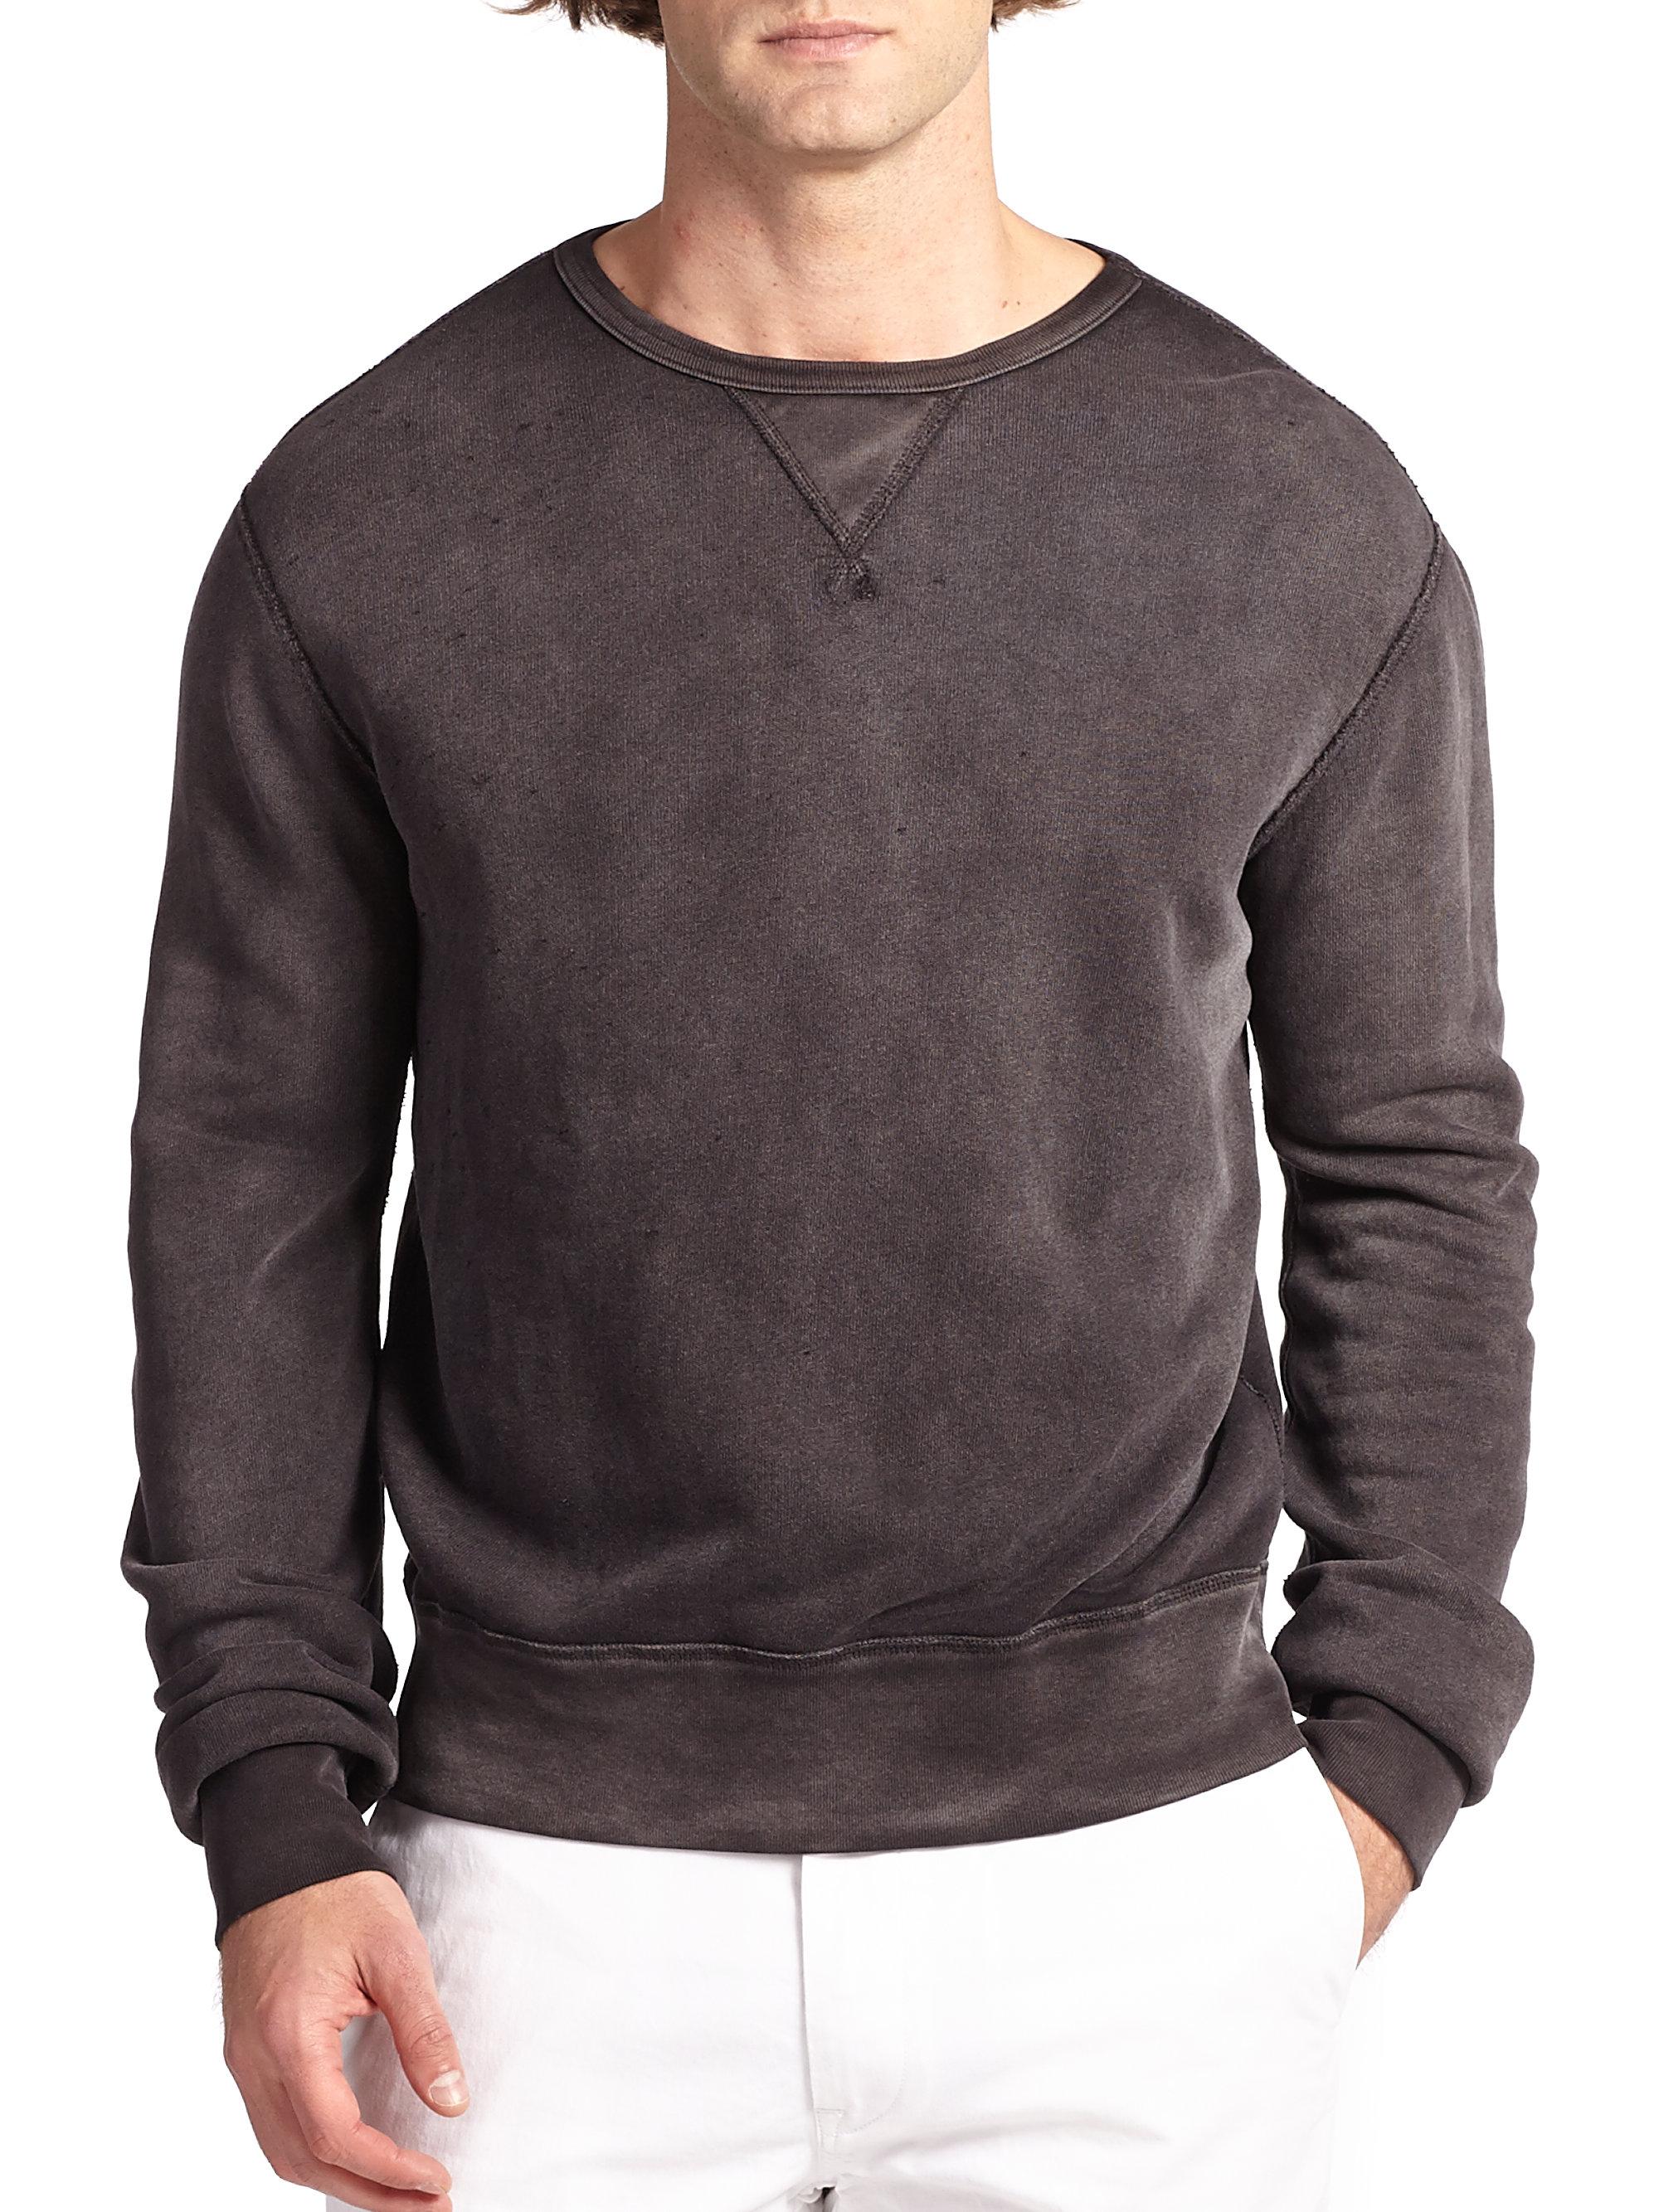 calvin klein long sleeved zip jacket in gray for men grey. Black Bedroom Furniture Sets. Home Design Ideas